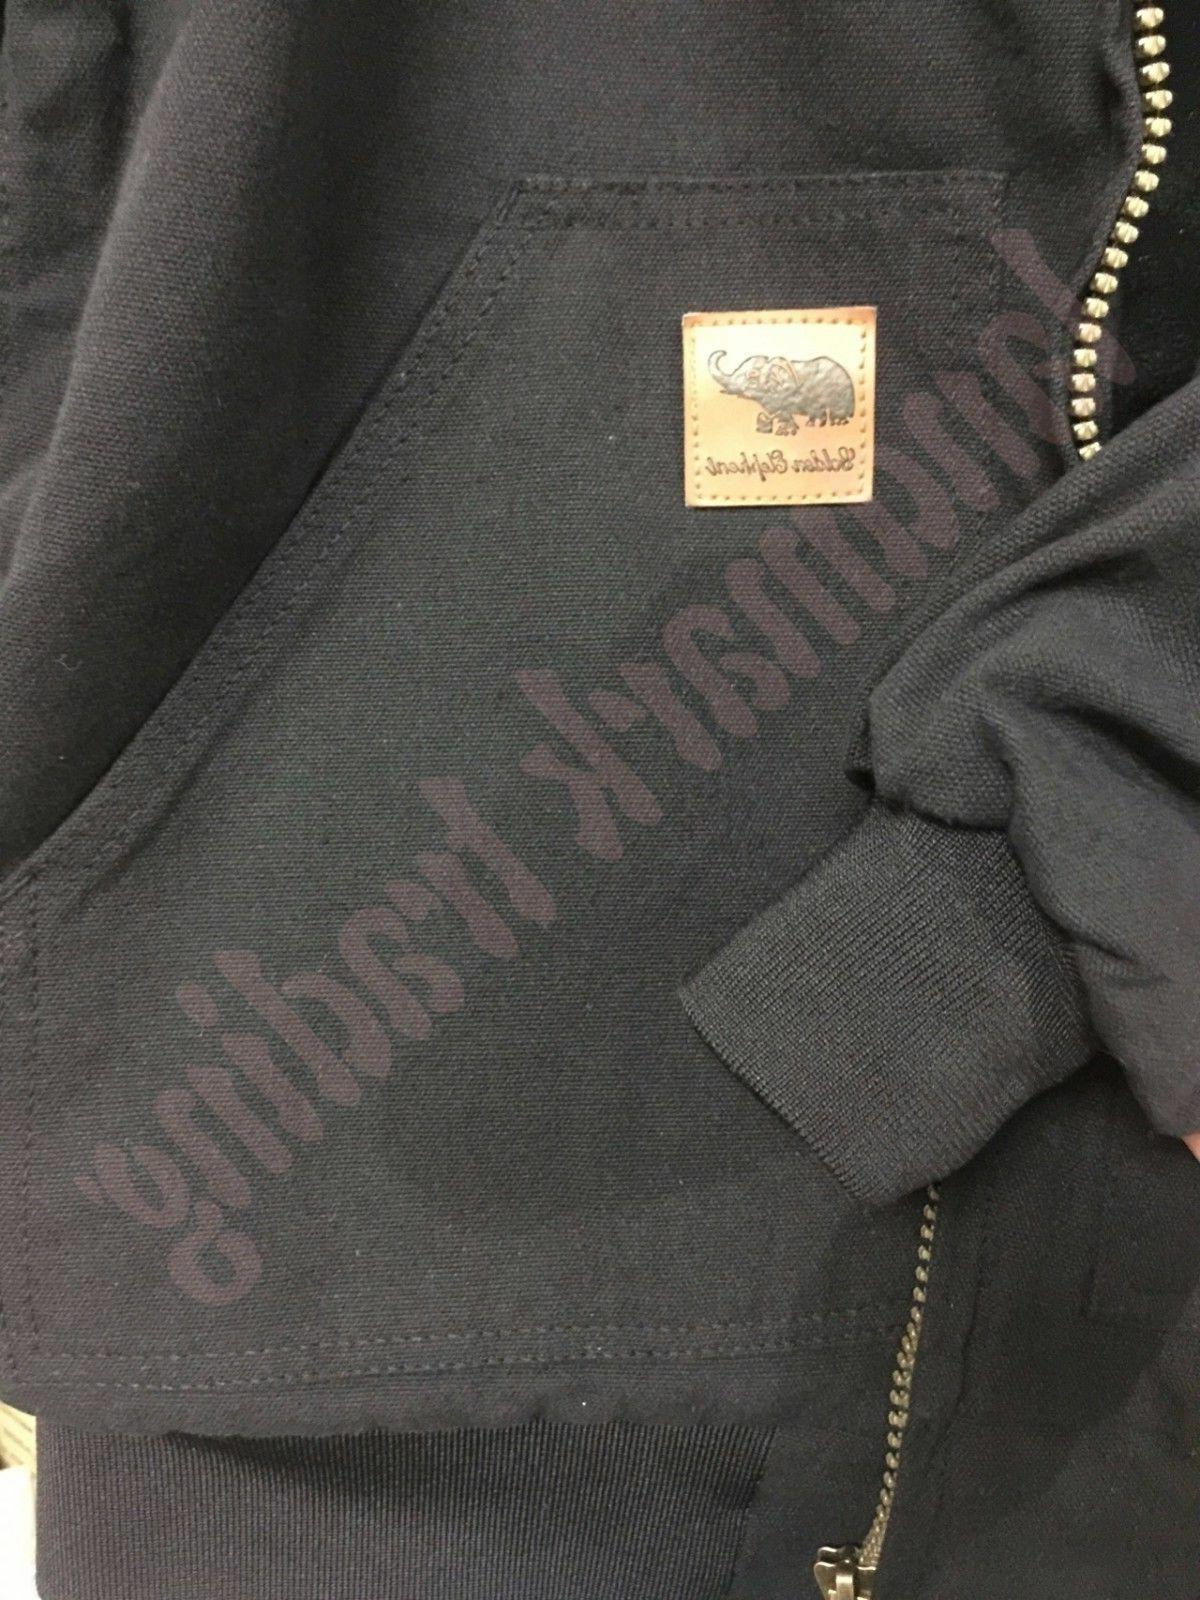 Mens Winter Jacket Coat Canvas Waterproof